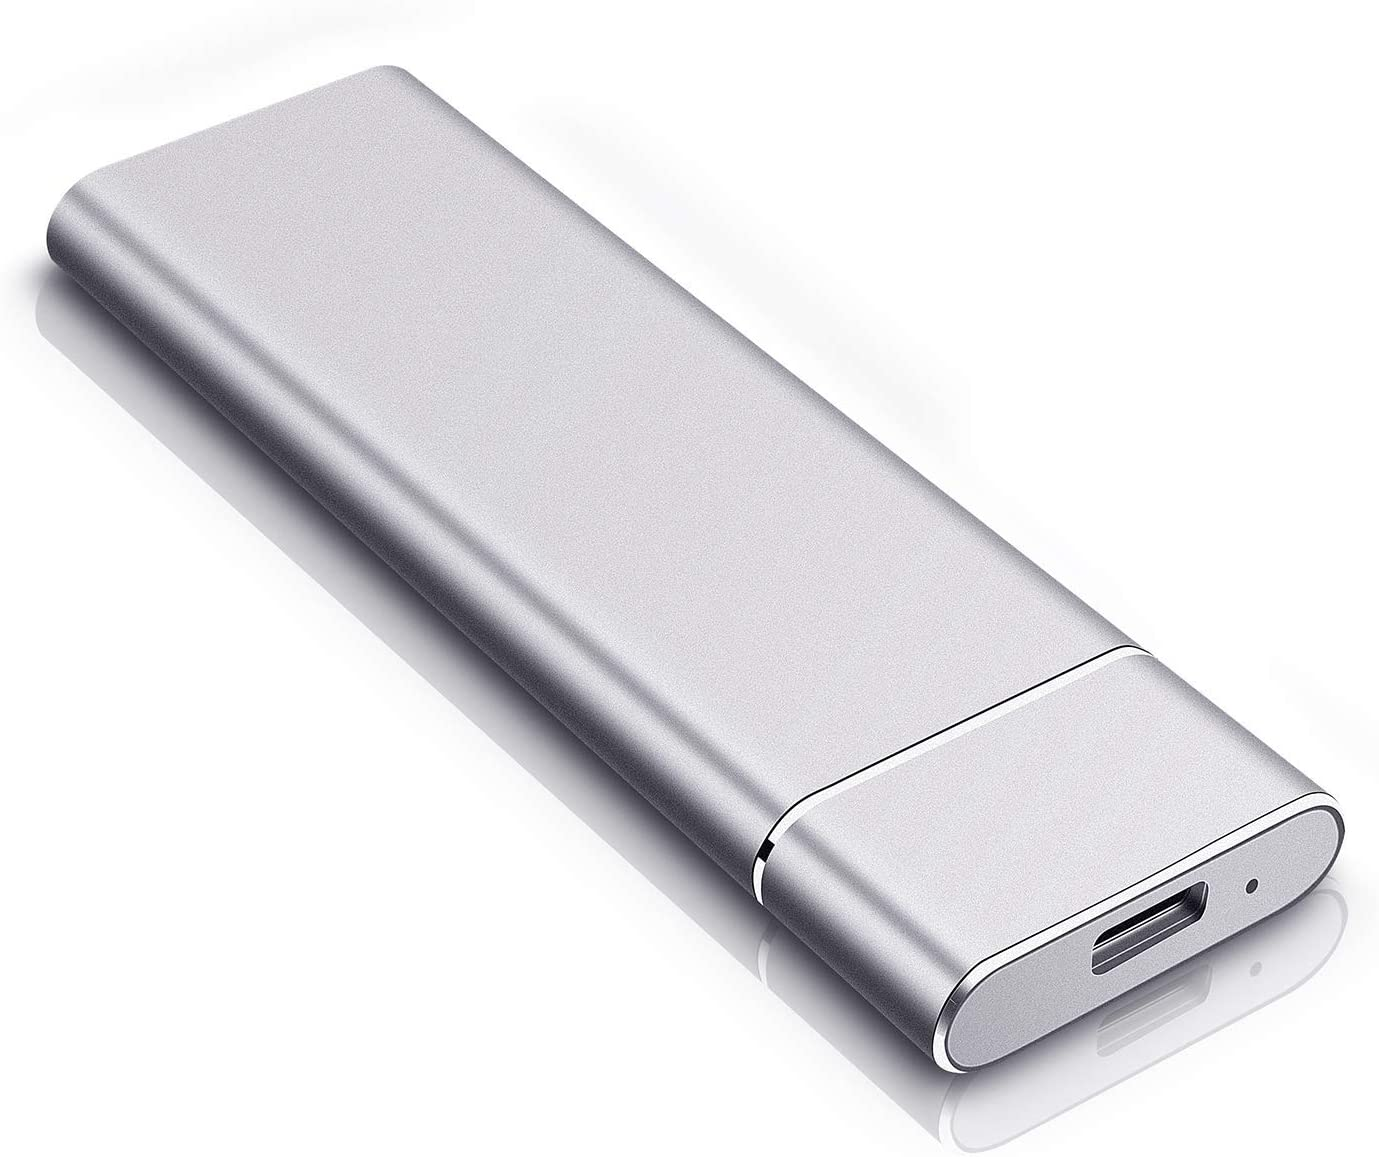 Portable External Hard Drive - Ultra Slim Portable Hard Drive External 1TB 2TB Hard Drive Compatible with Mac, Laptop, PC (2TB-Silver)